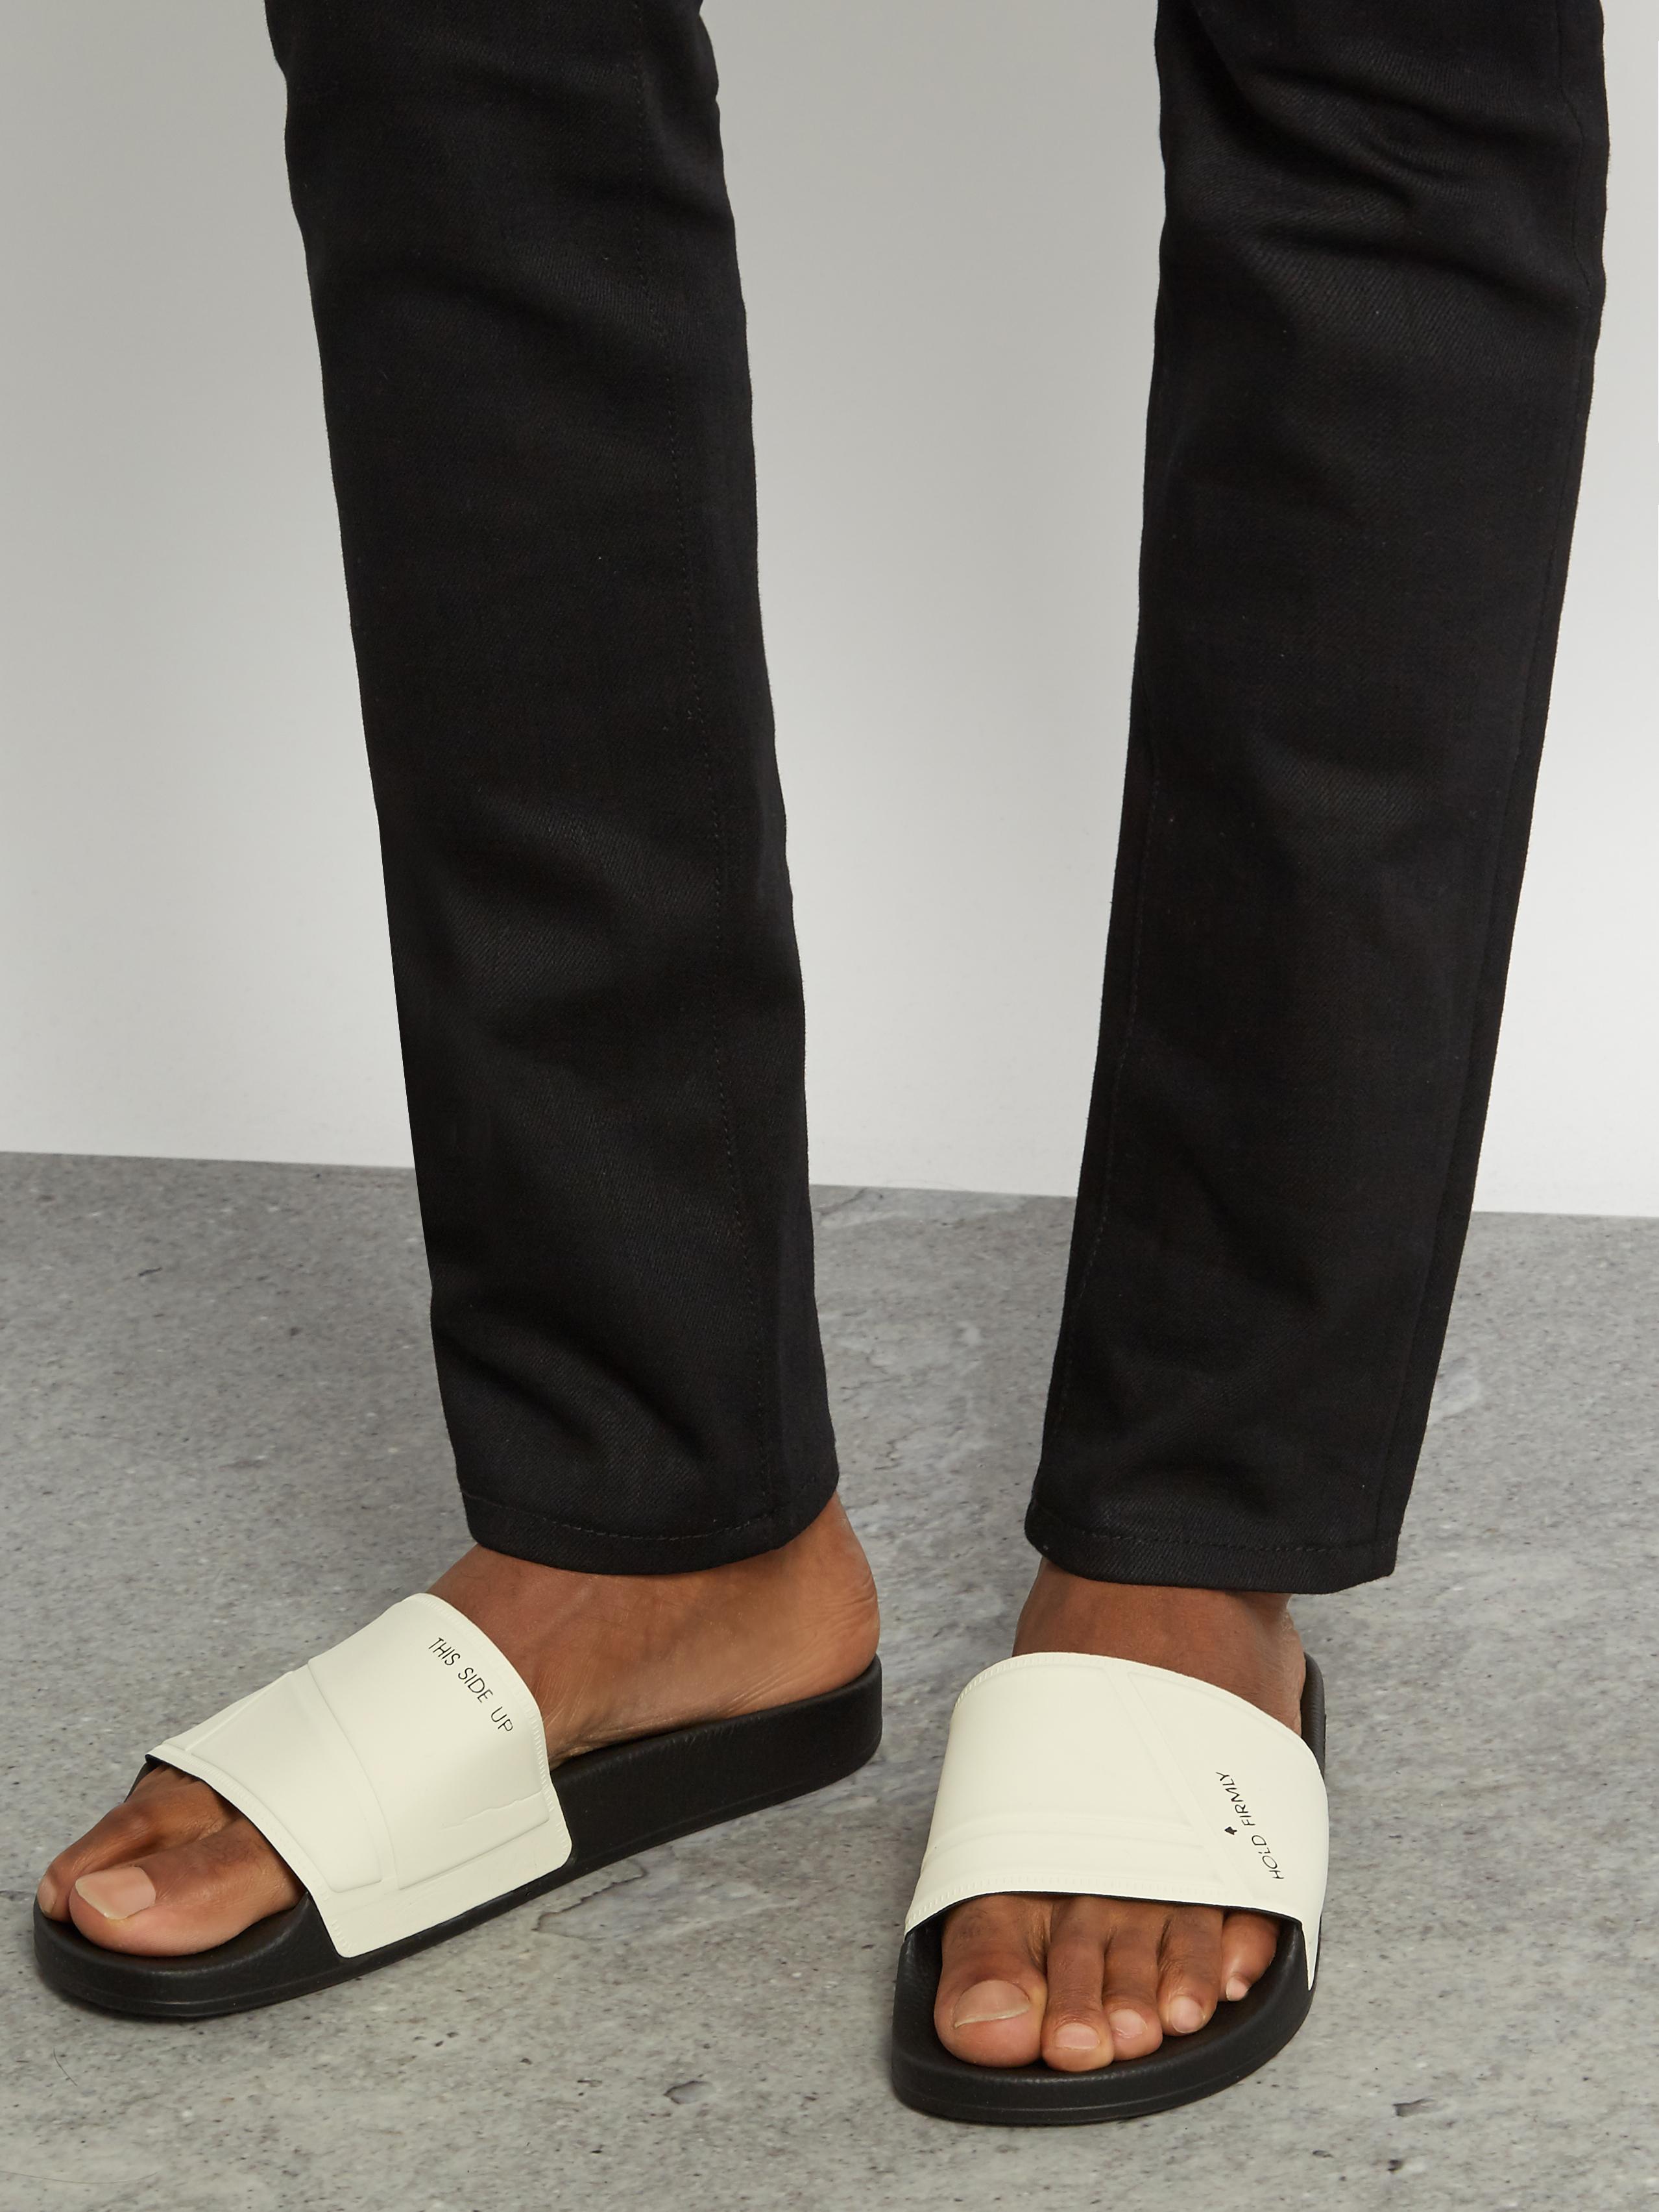 2245c97616d68 Lyst - adidas By Raf Simons Bunny Adilette Pool Slides in Black for Men